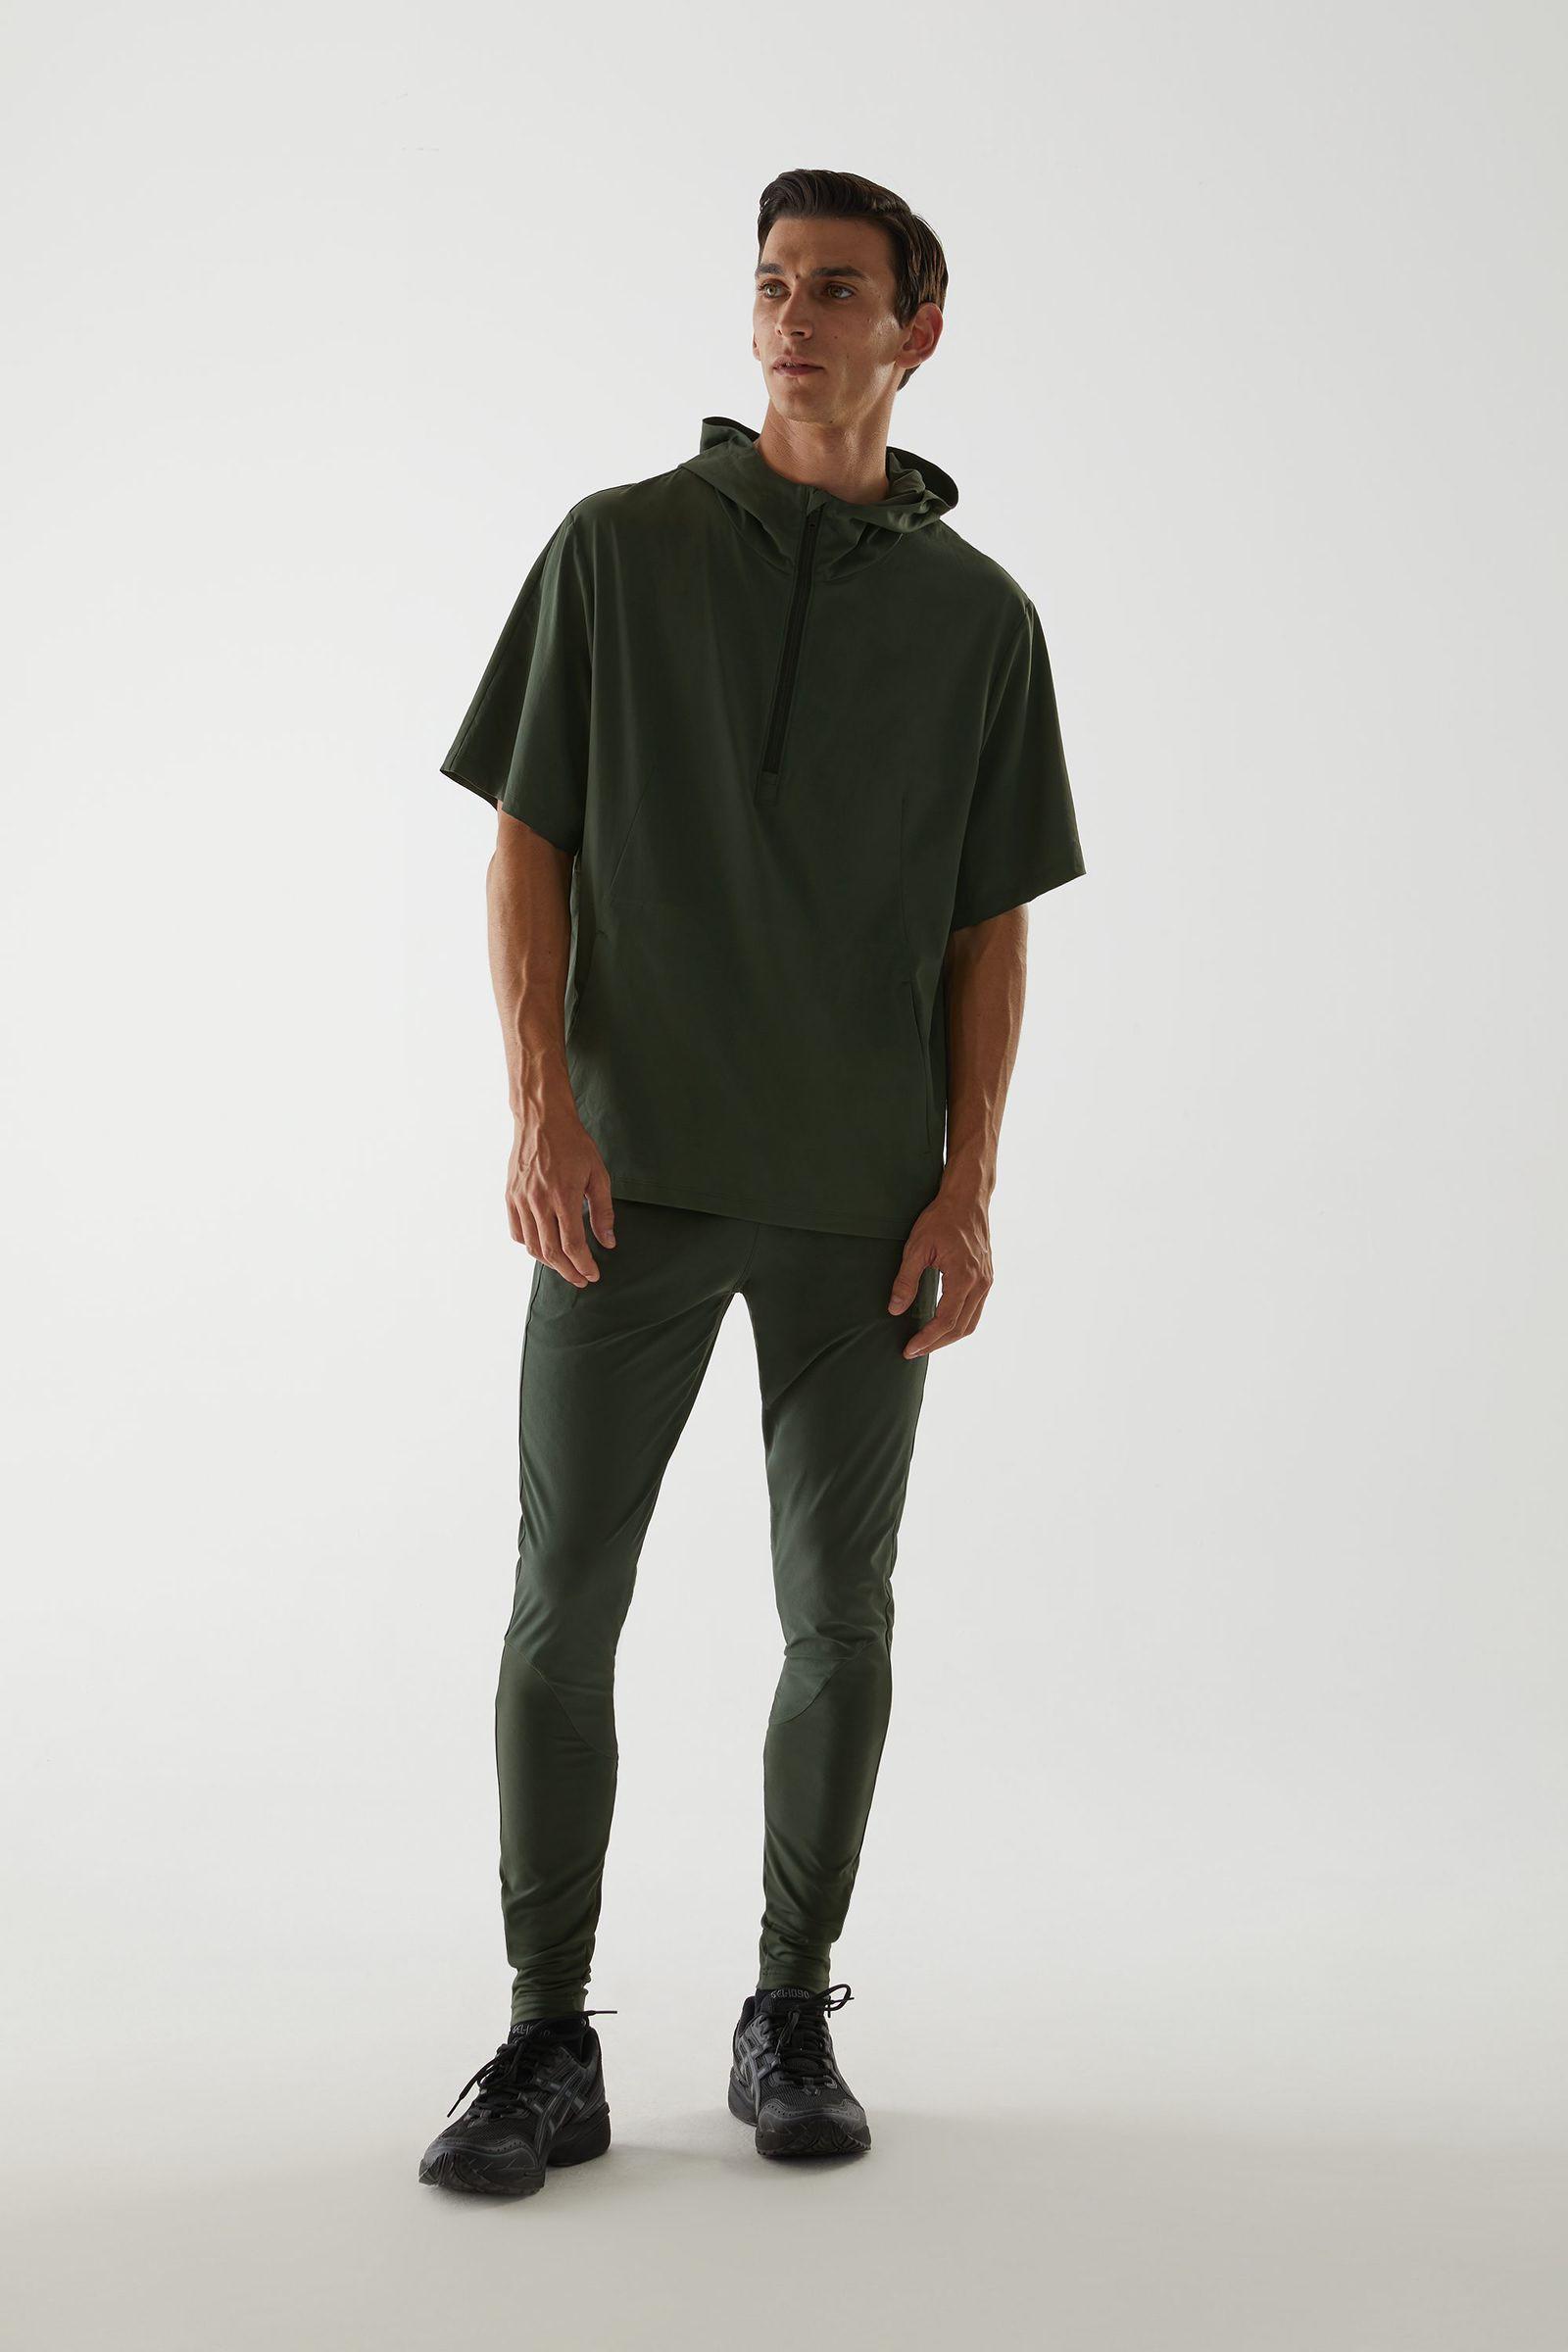 COS 리사이클드 폴리에스터 풀오버 재킷의 그린컬러 ECOMLook입니다.